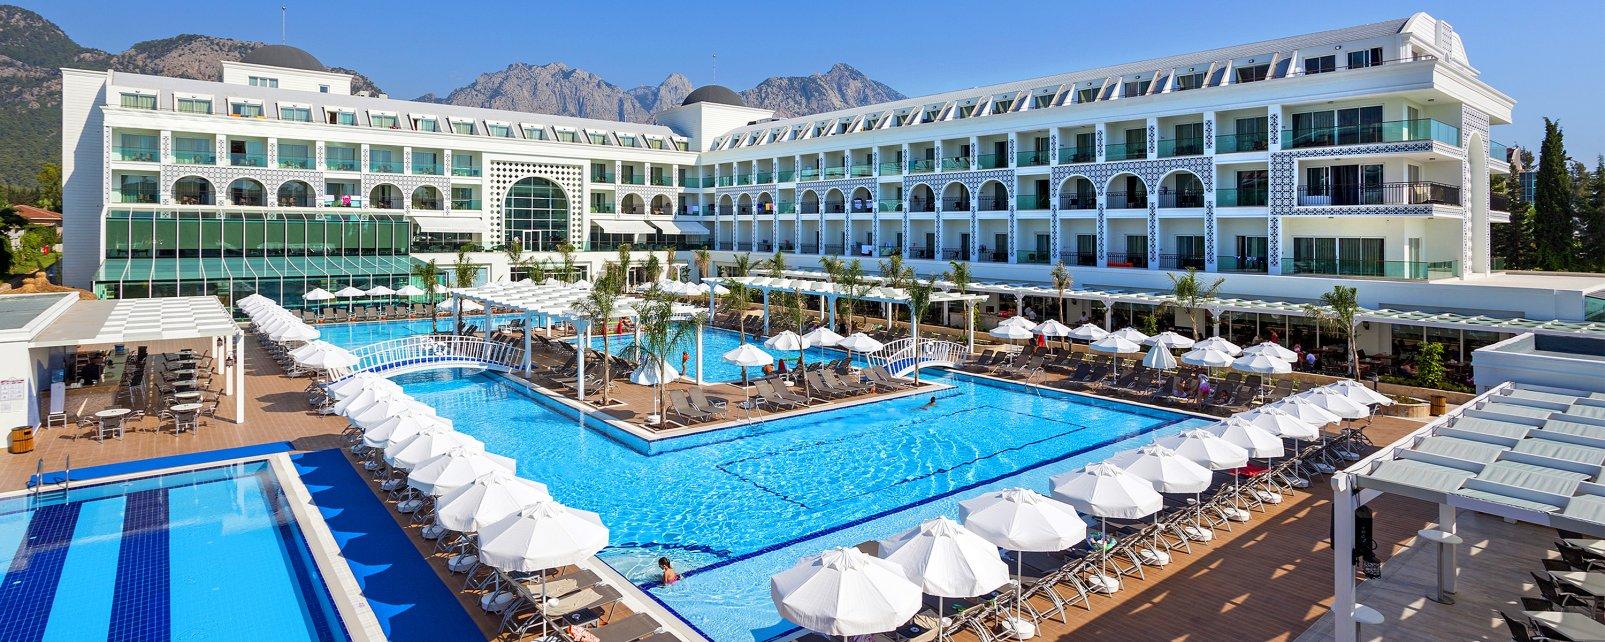 Hôtel Karmir Resort & Spa